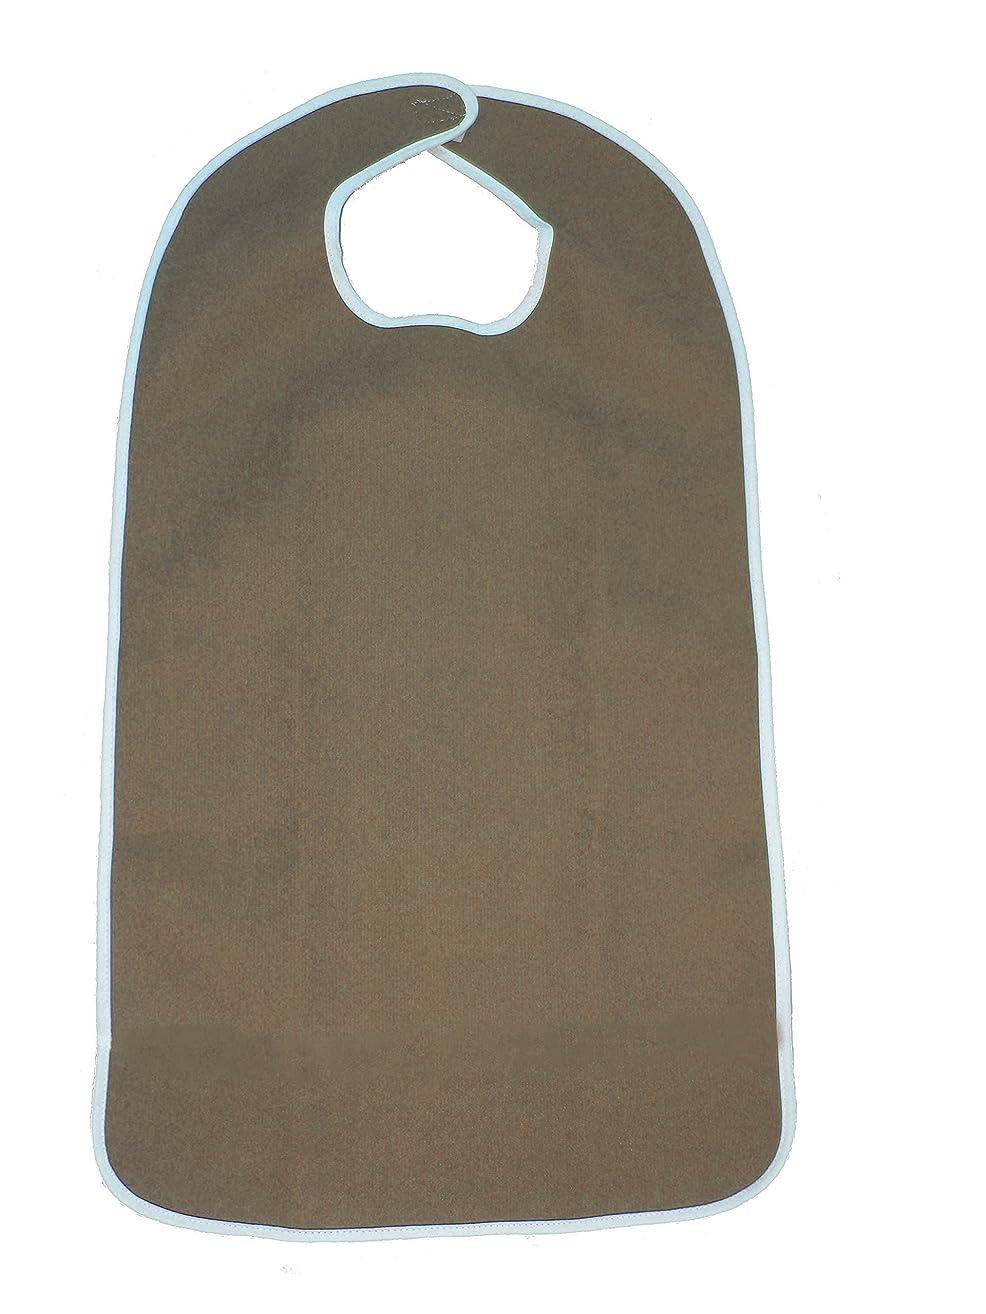 FlexaMed Waterproof Terry Cloth Adult Bib w/ Velcro Closure (Hunter Green - 16